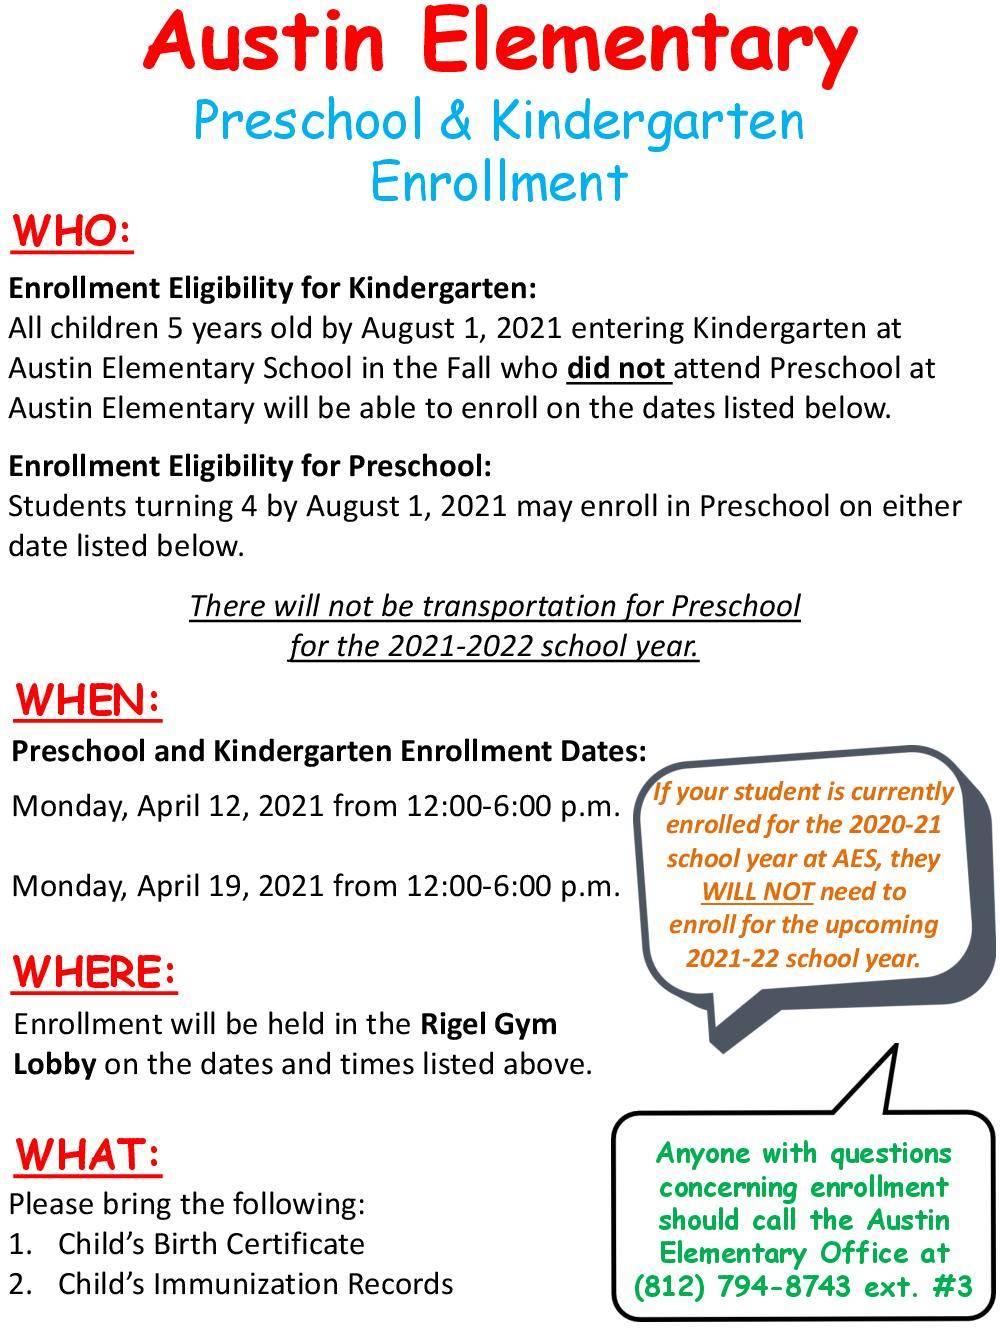 K and PK enrollment